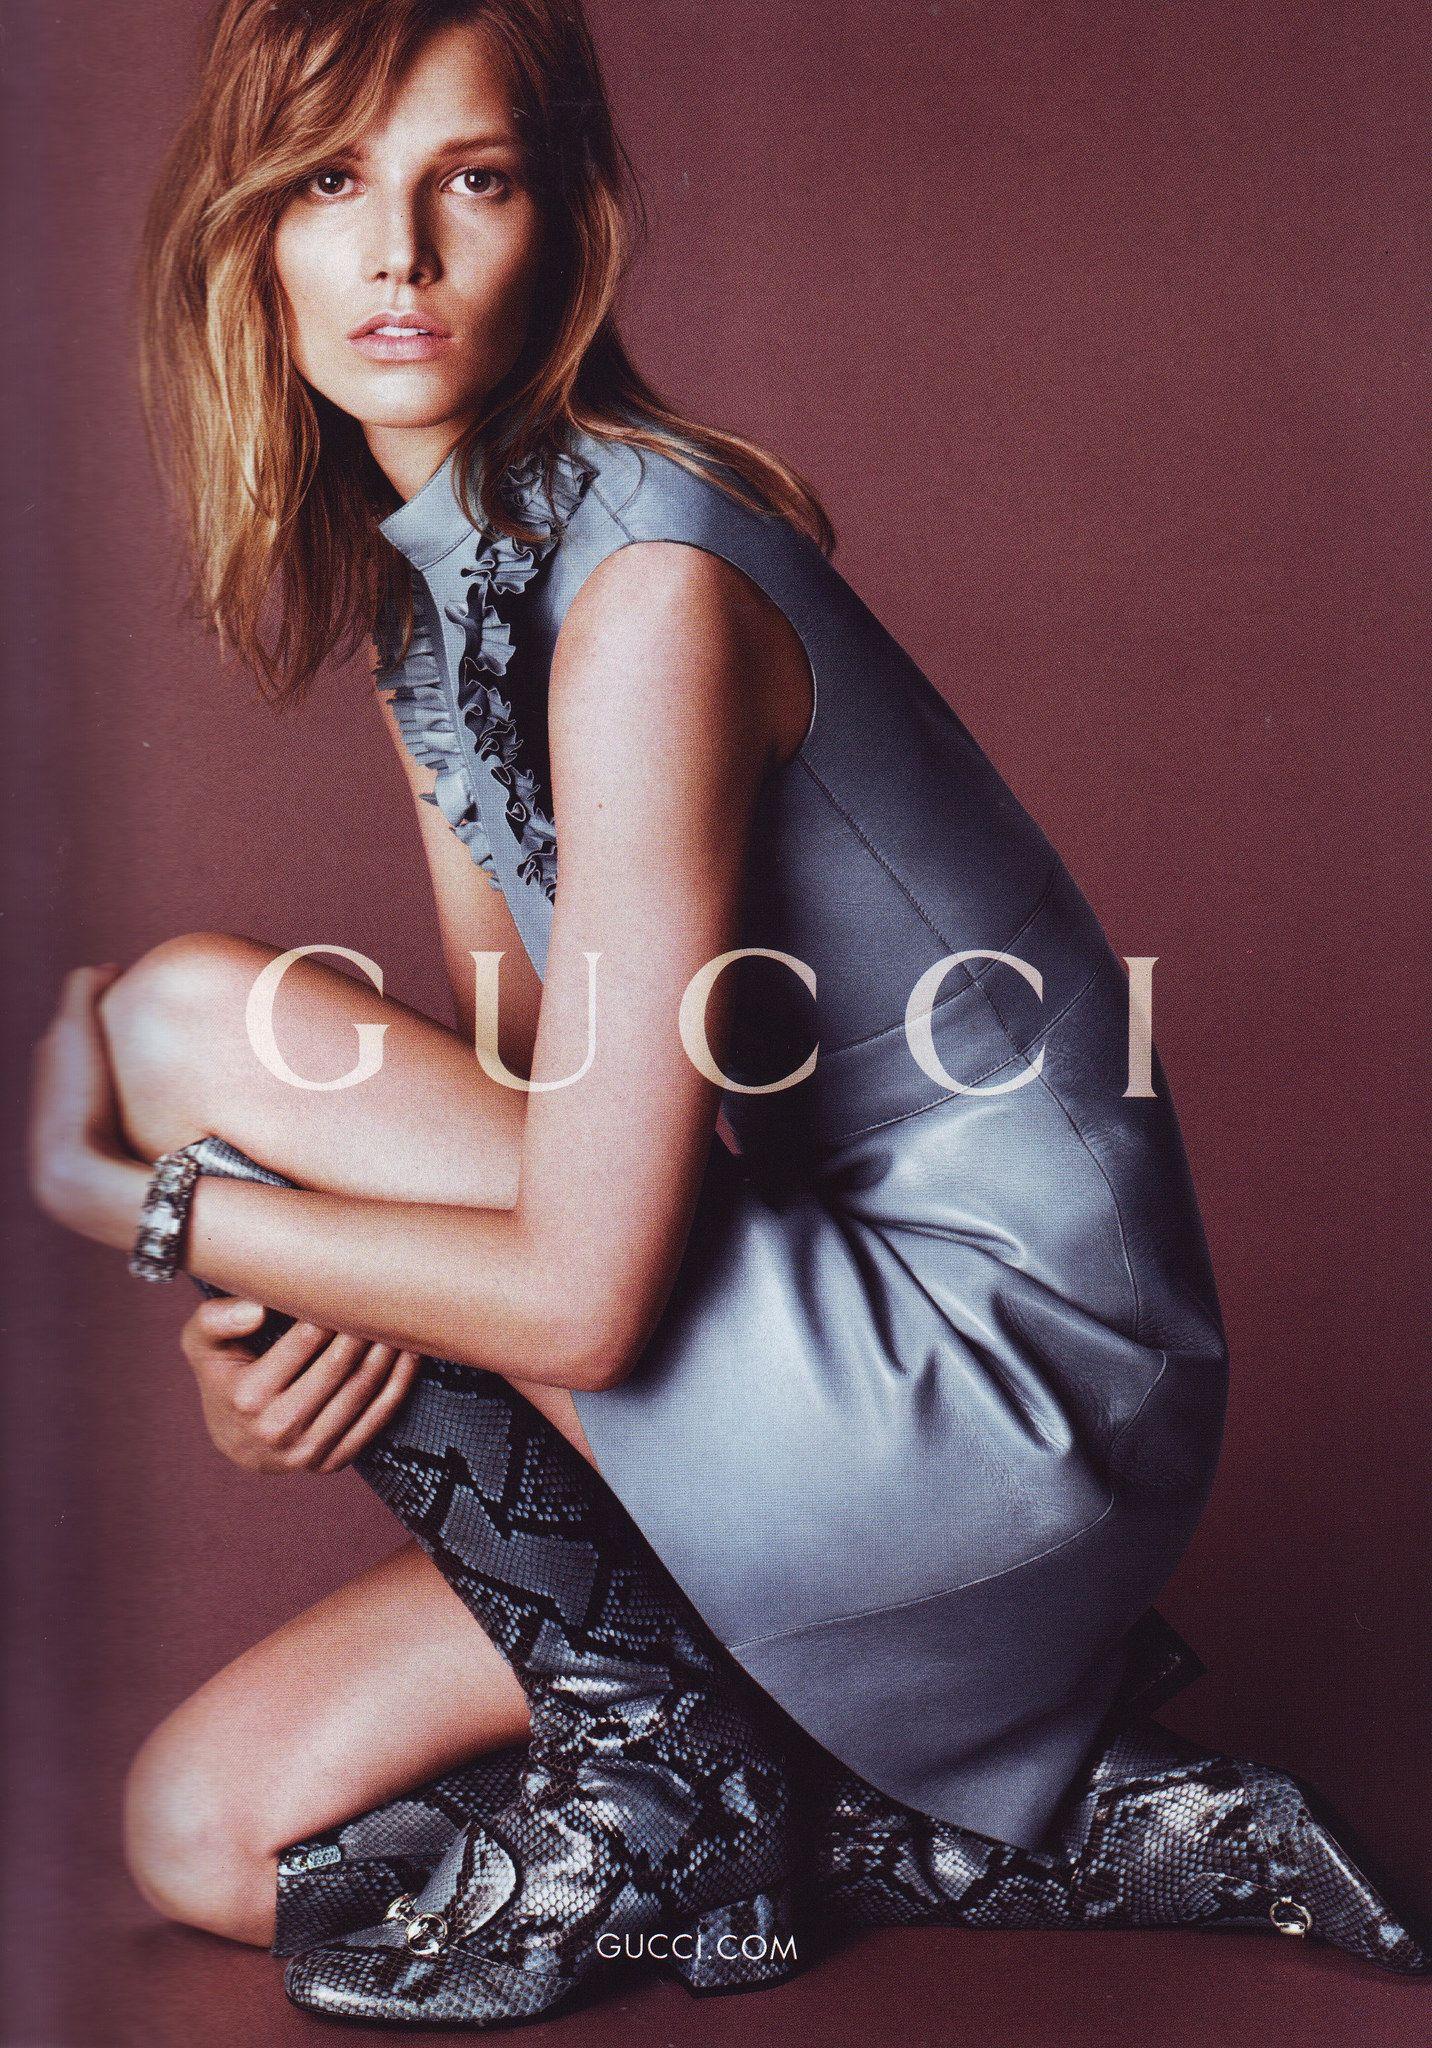 , Vogue Fall 14 Gucci 1, Anja Rubik Blog, Anja Rubik Blog